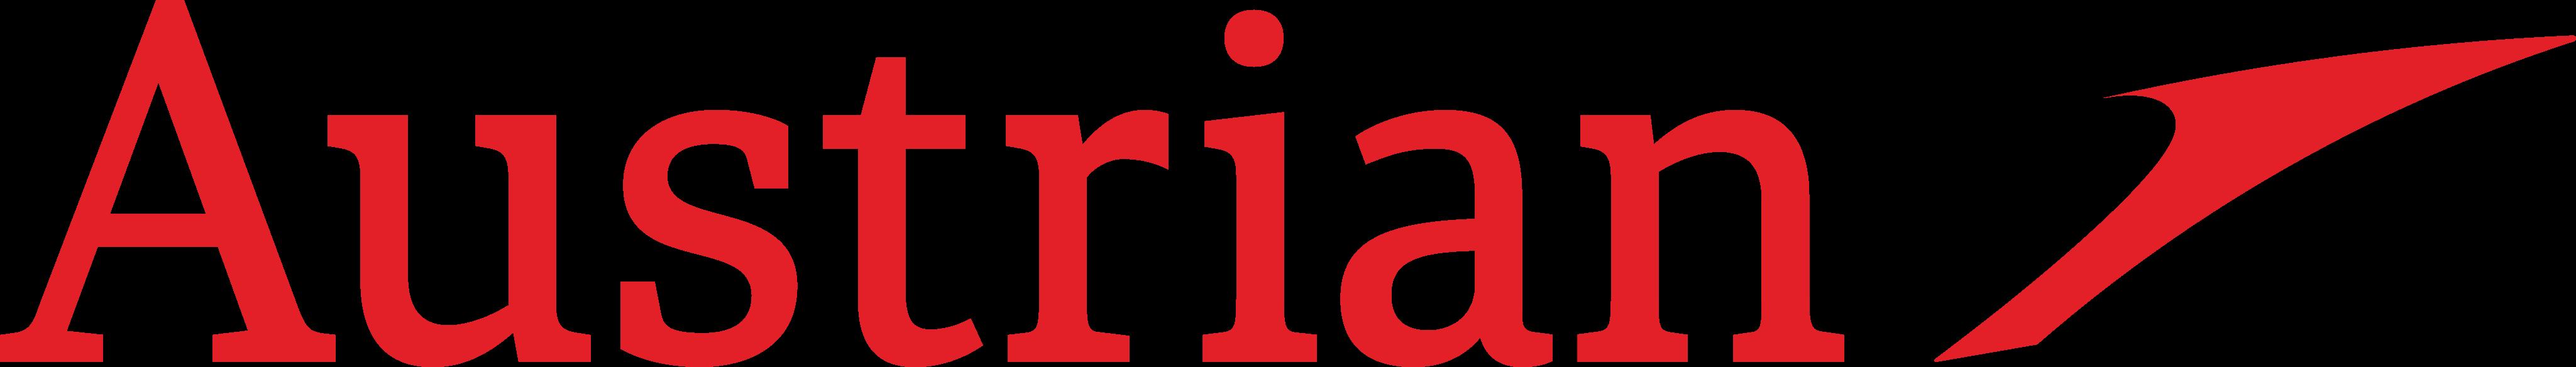 Austrian Airlines Logo.